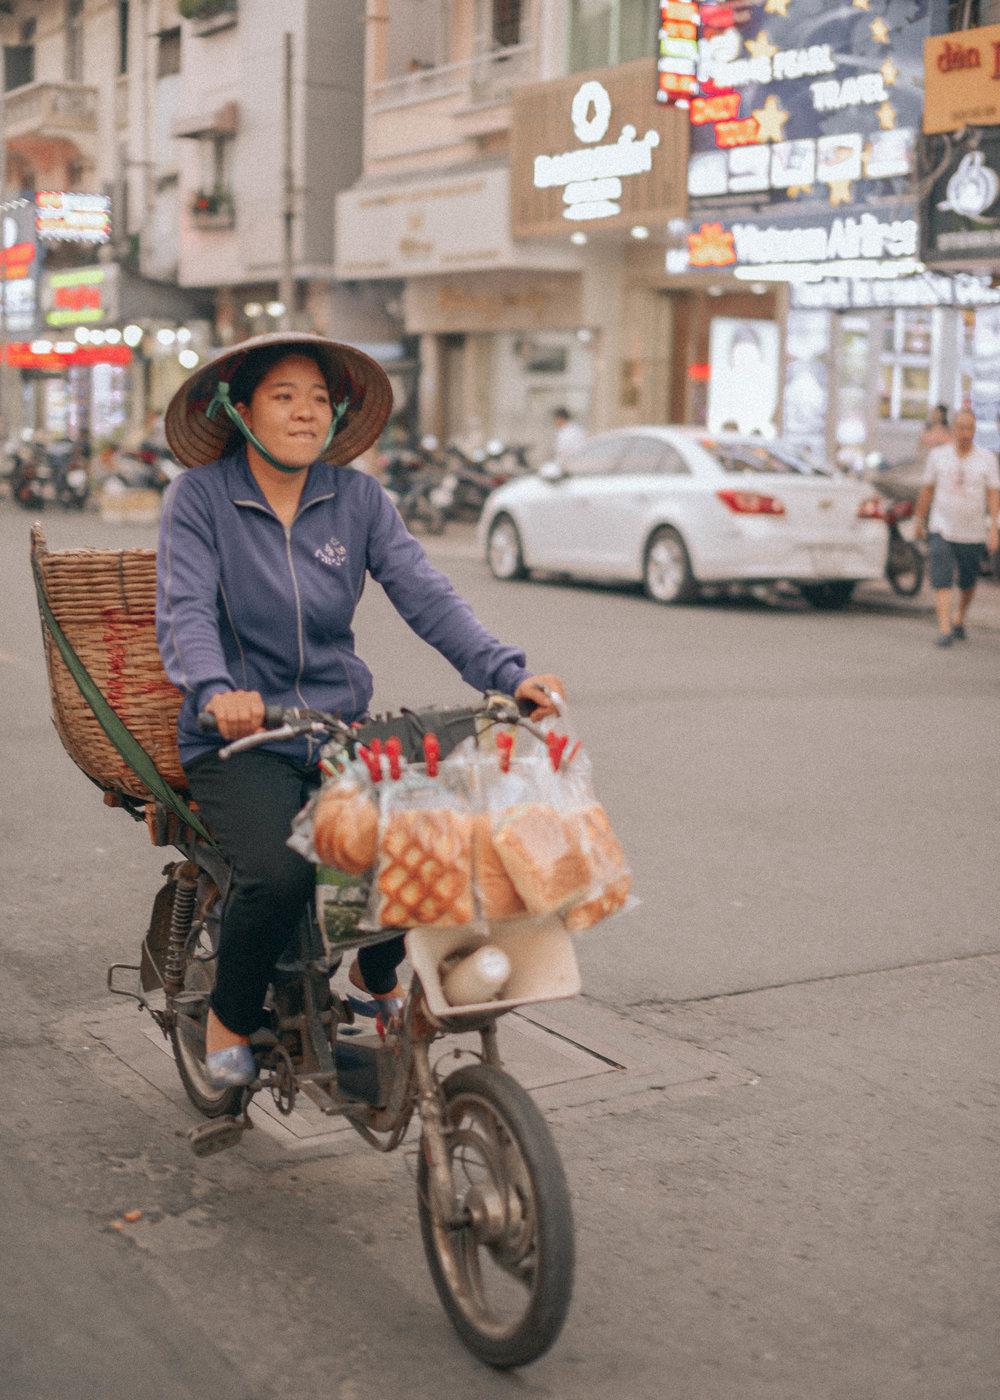 ho-chi-minh-city-vietnam-by-lisa-linh